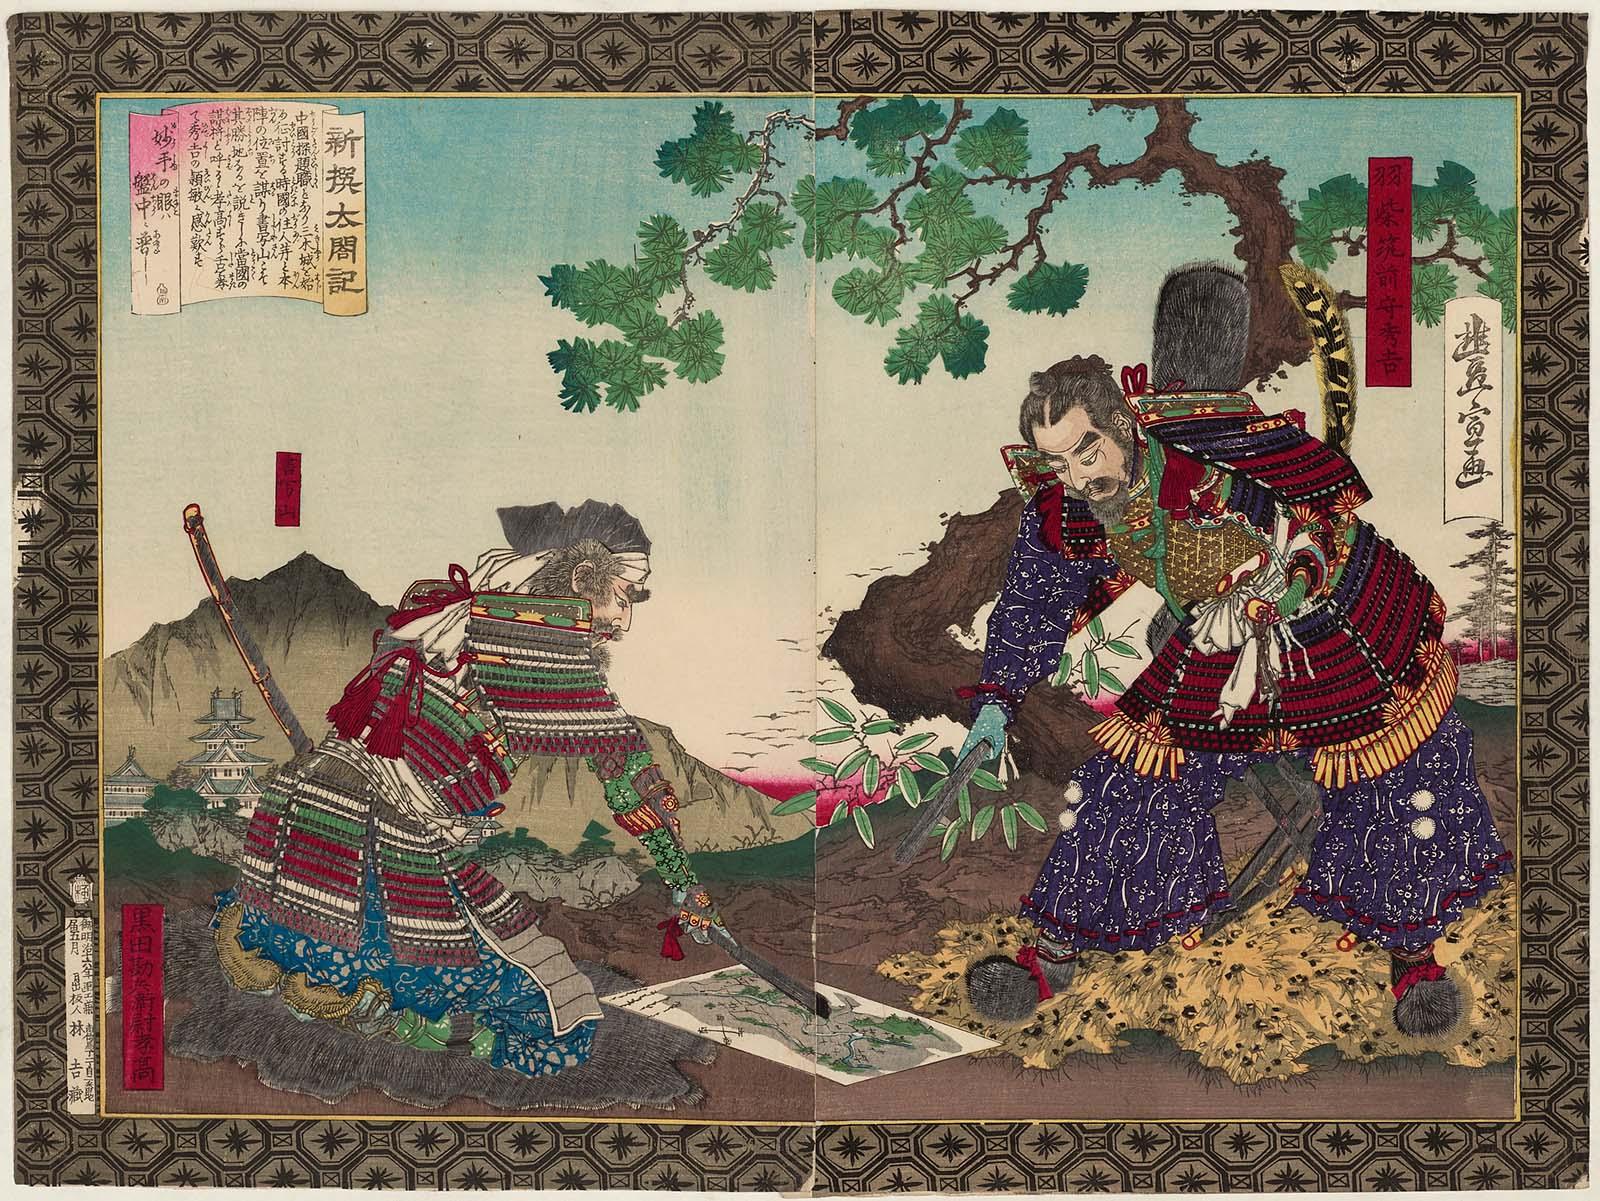 diptych by Utagawa Toyonobu